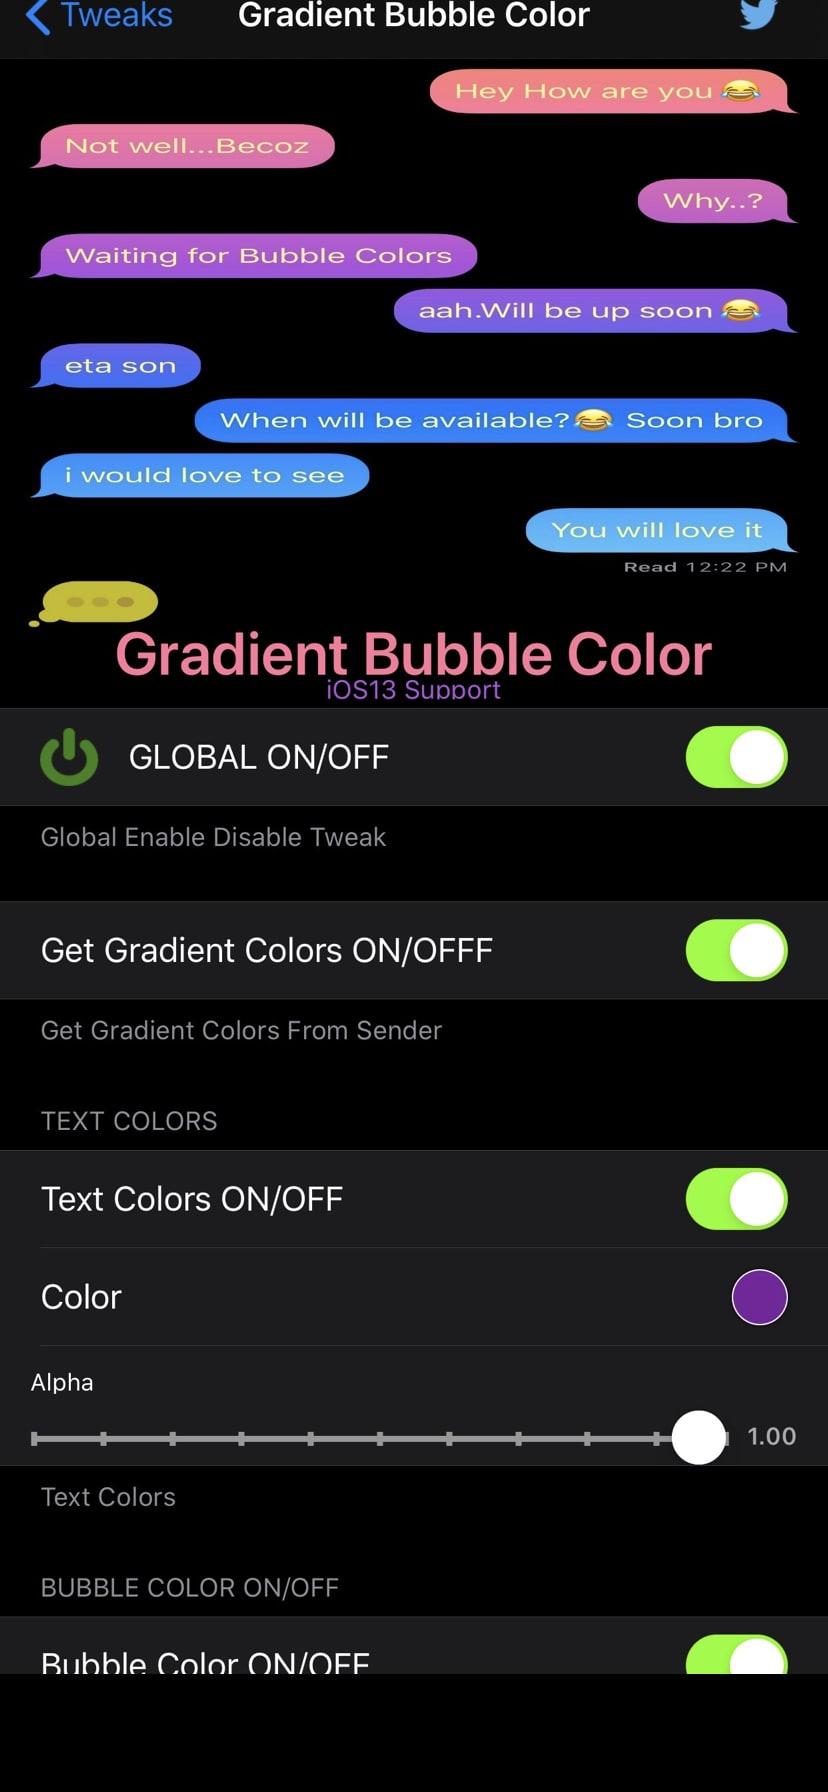 Download GradientBubbleColor 1.0